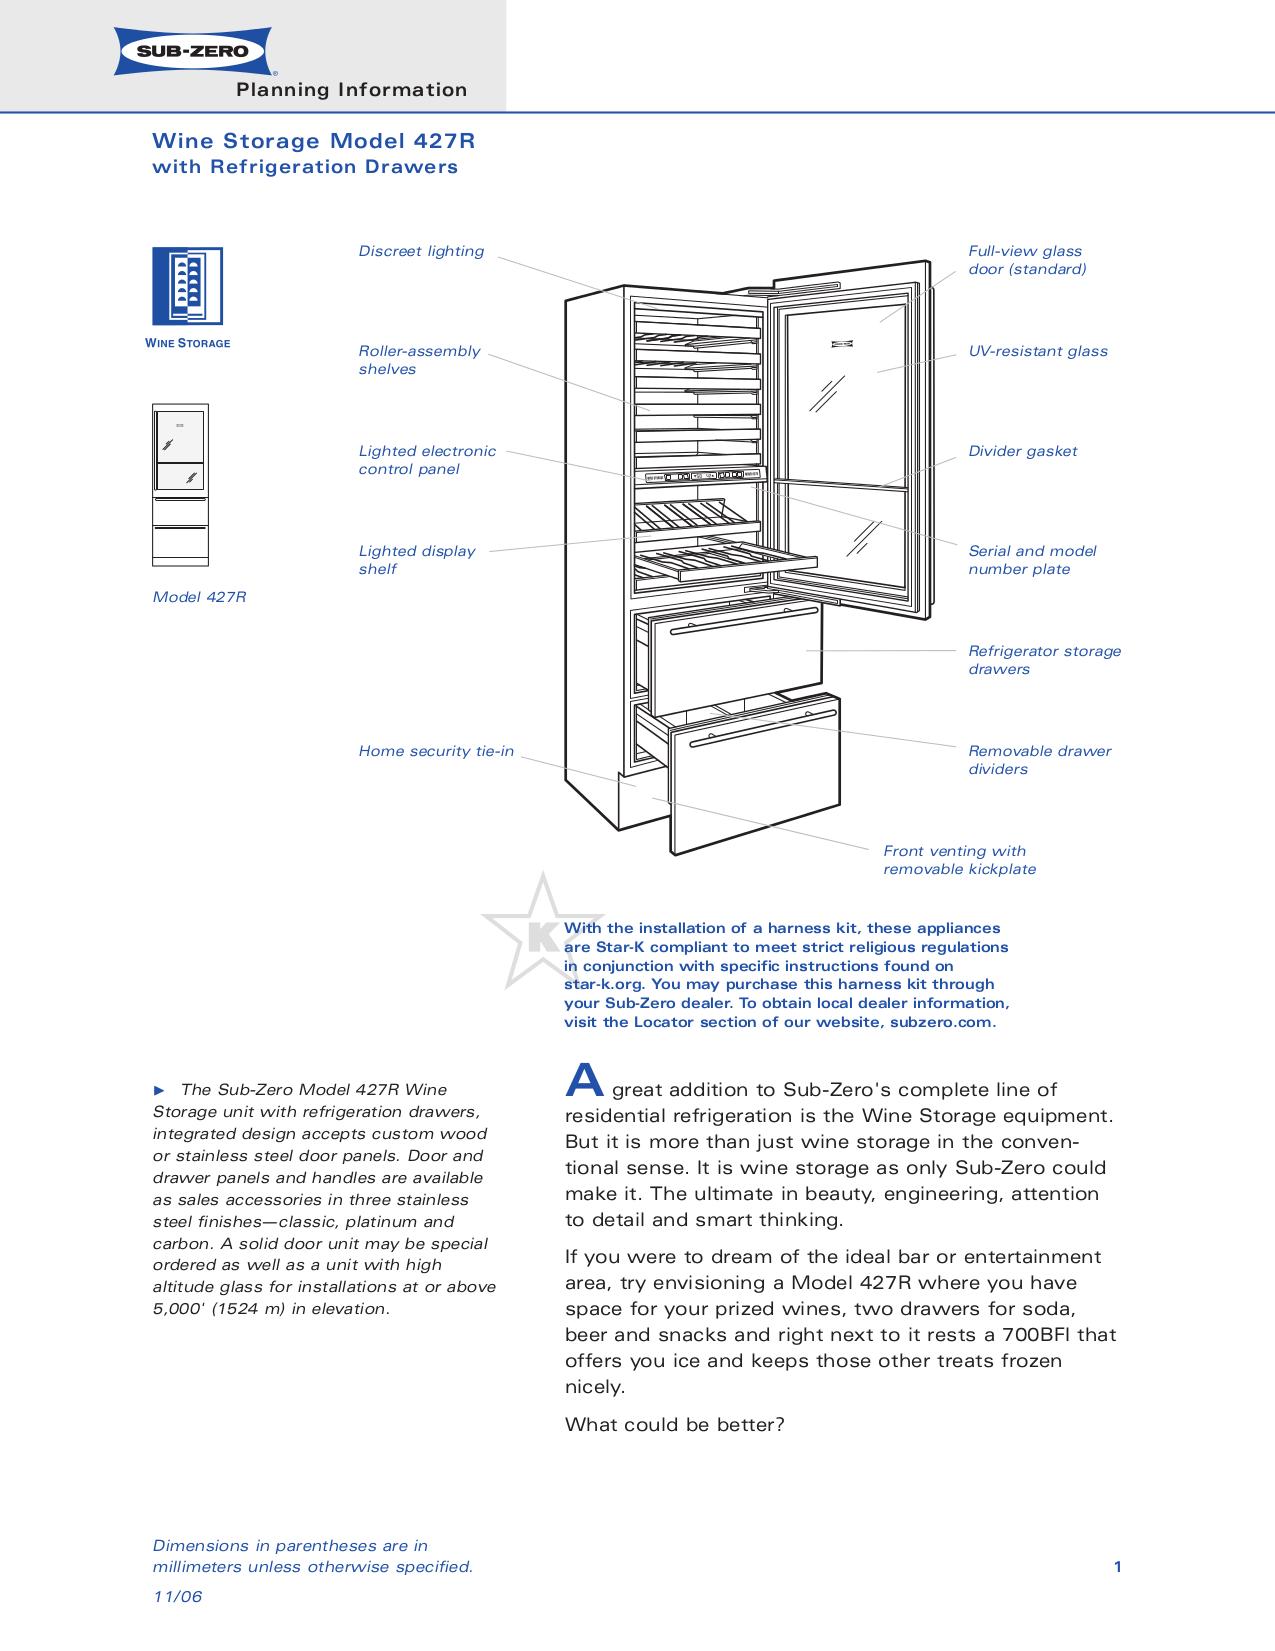 sub zero refrigerator manual image of refrigerator imagestr co rh imagestr co sub zero 3211rfd refrigerator manual sub zero refrigerator manual 650